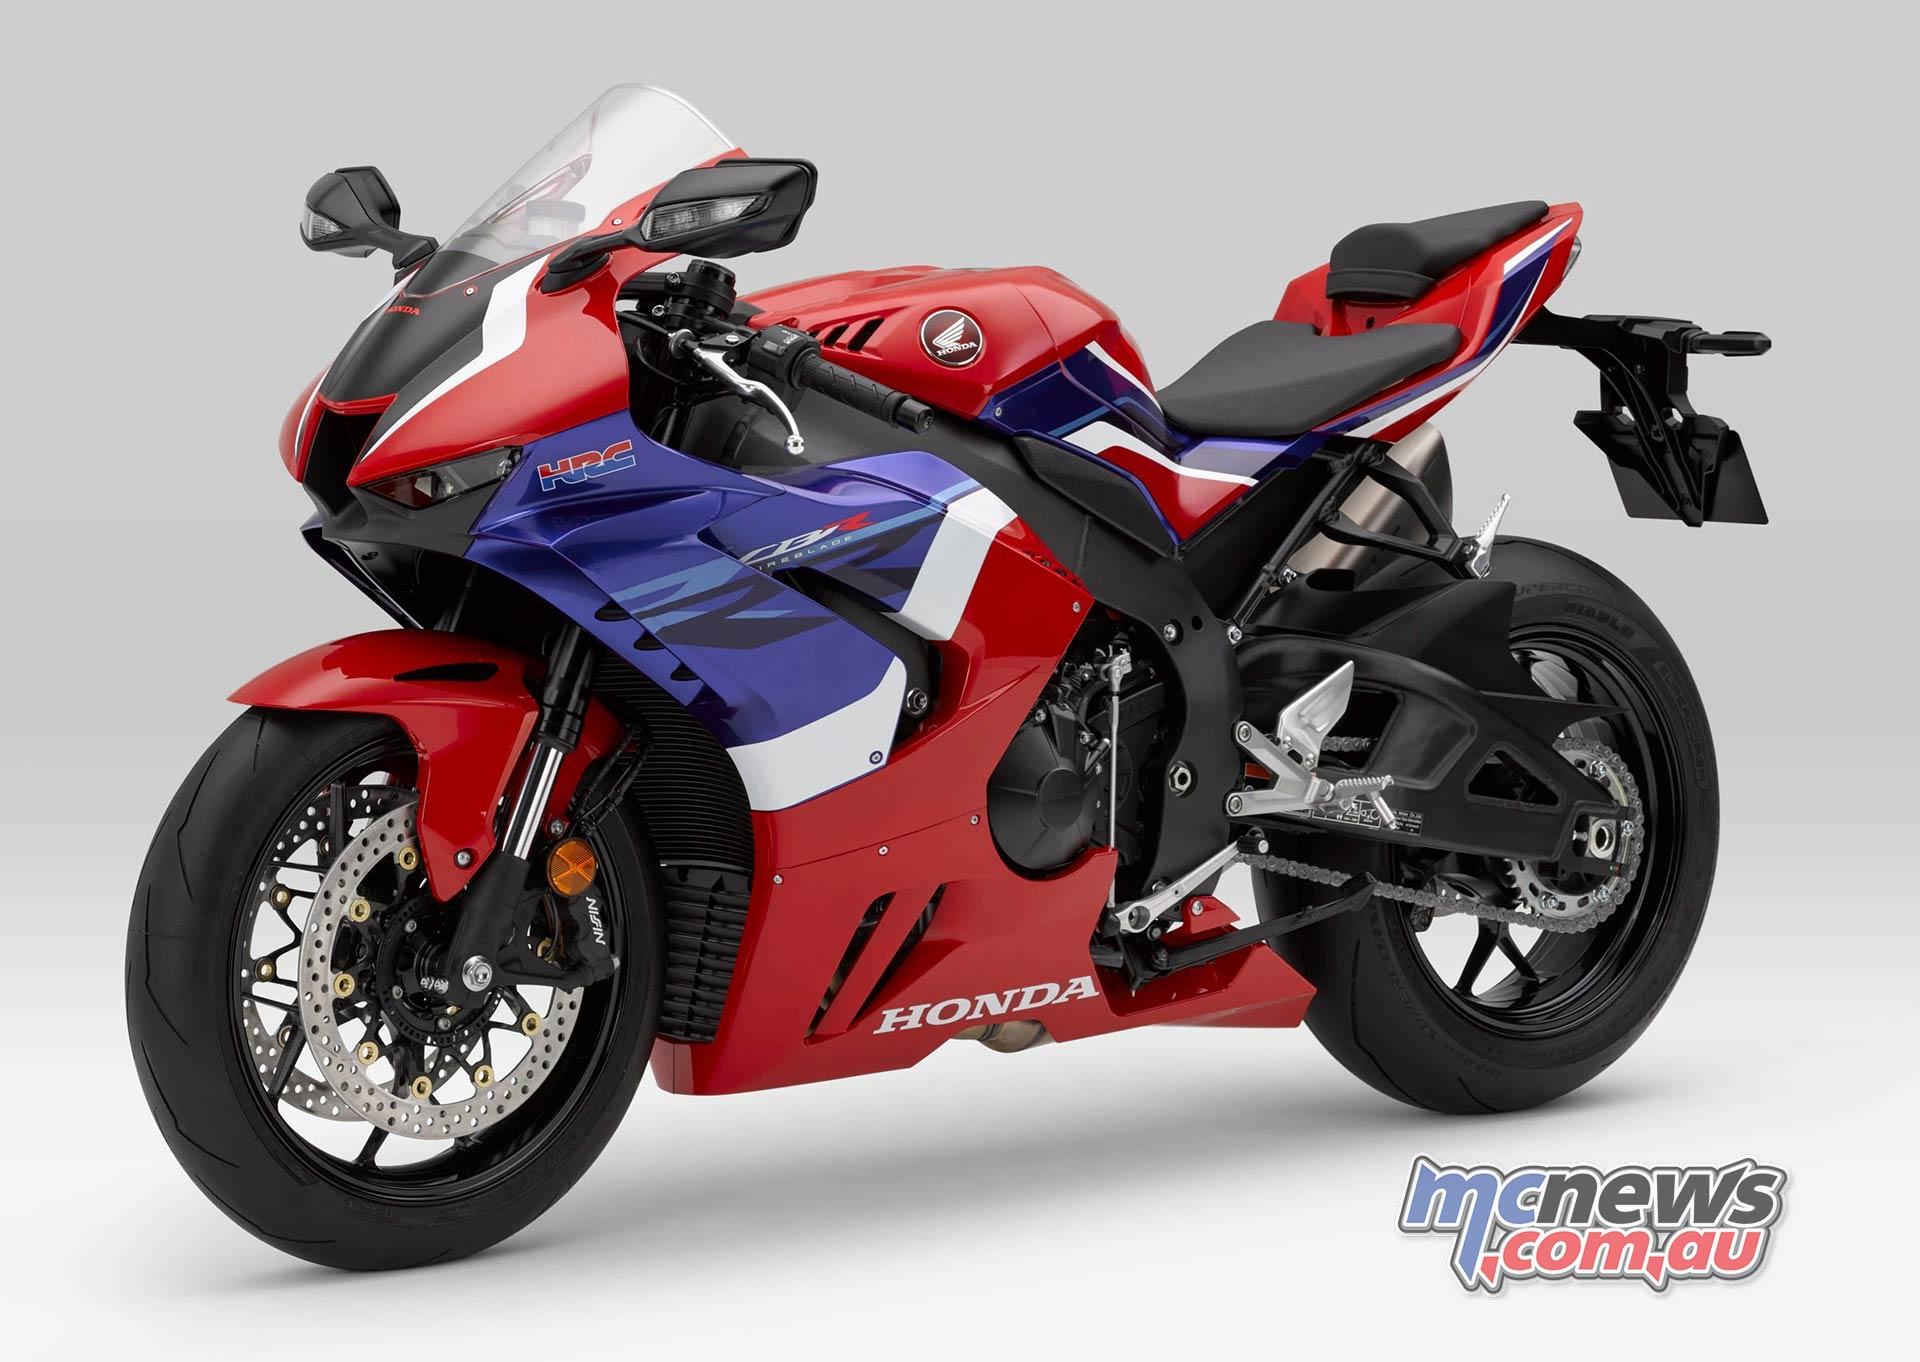 2020 Honda Cbr1000rr Fireblade Sp Arrives Motorcycle News Sport And Reviews